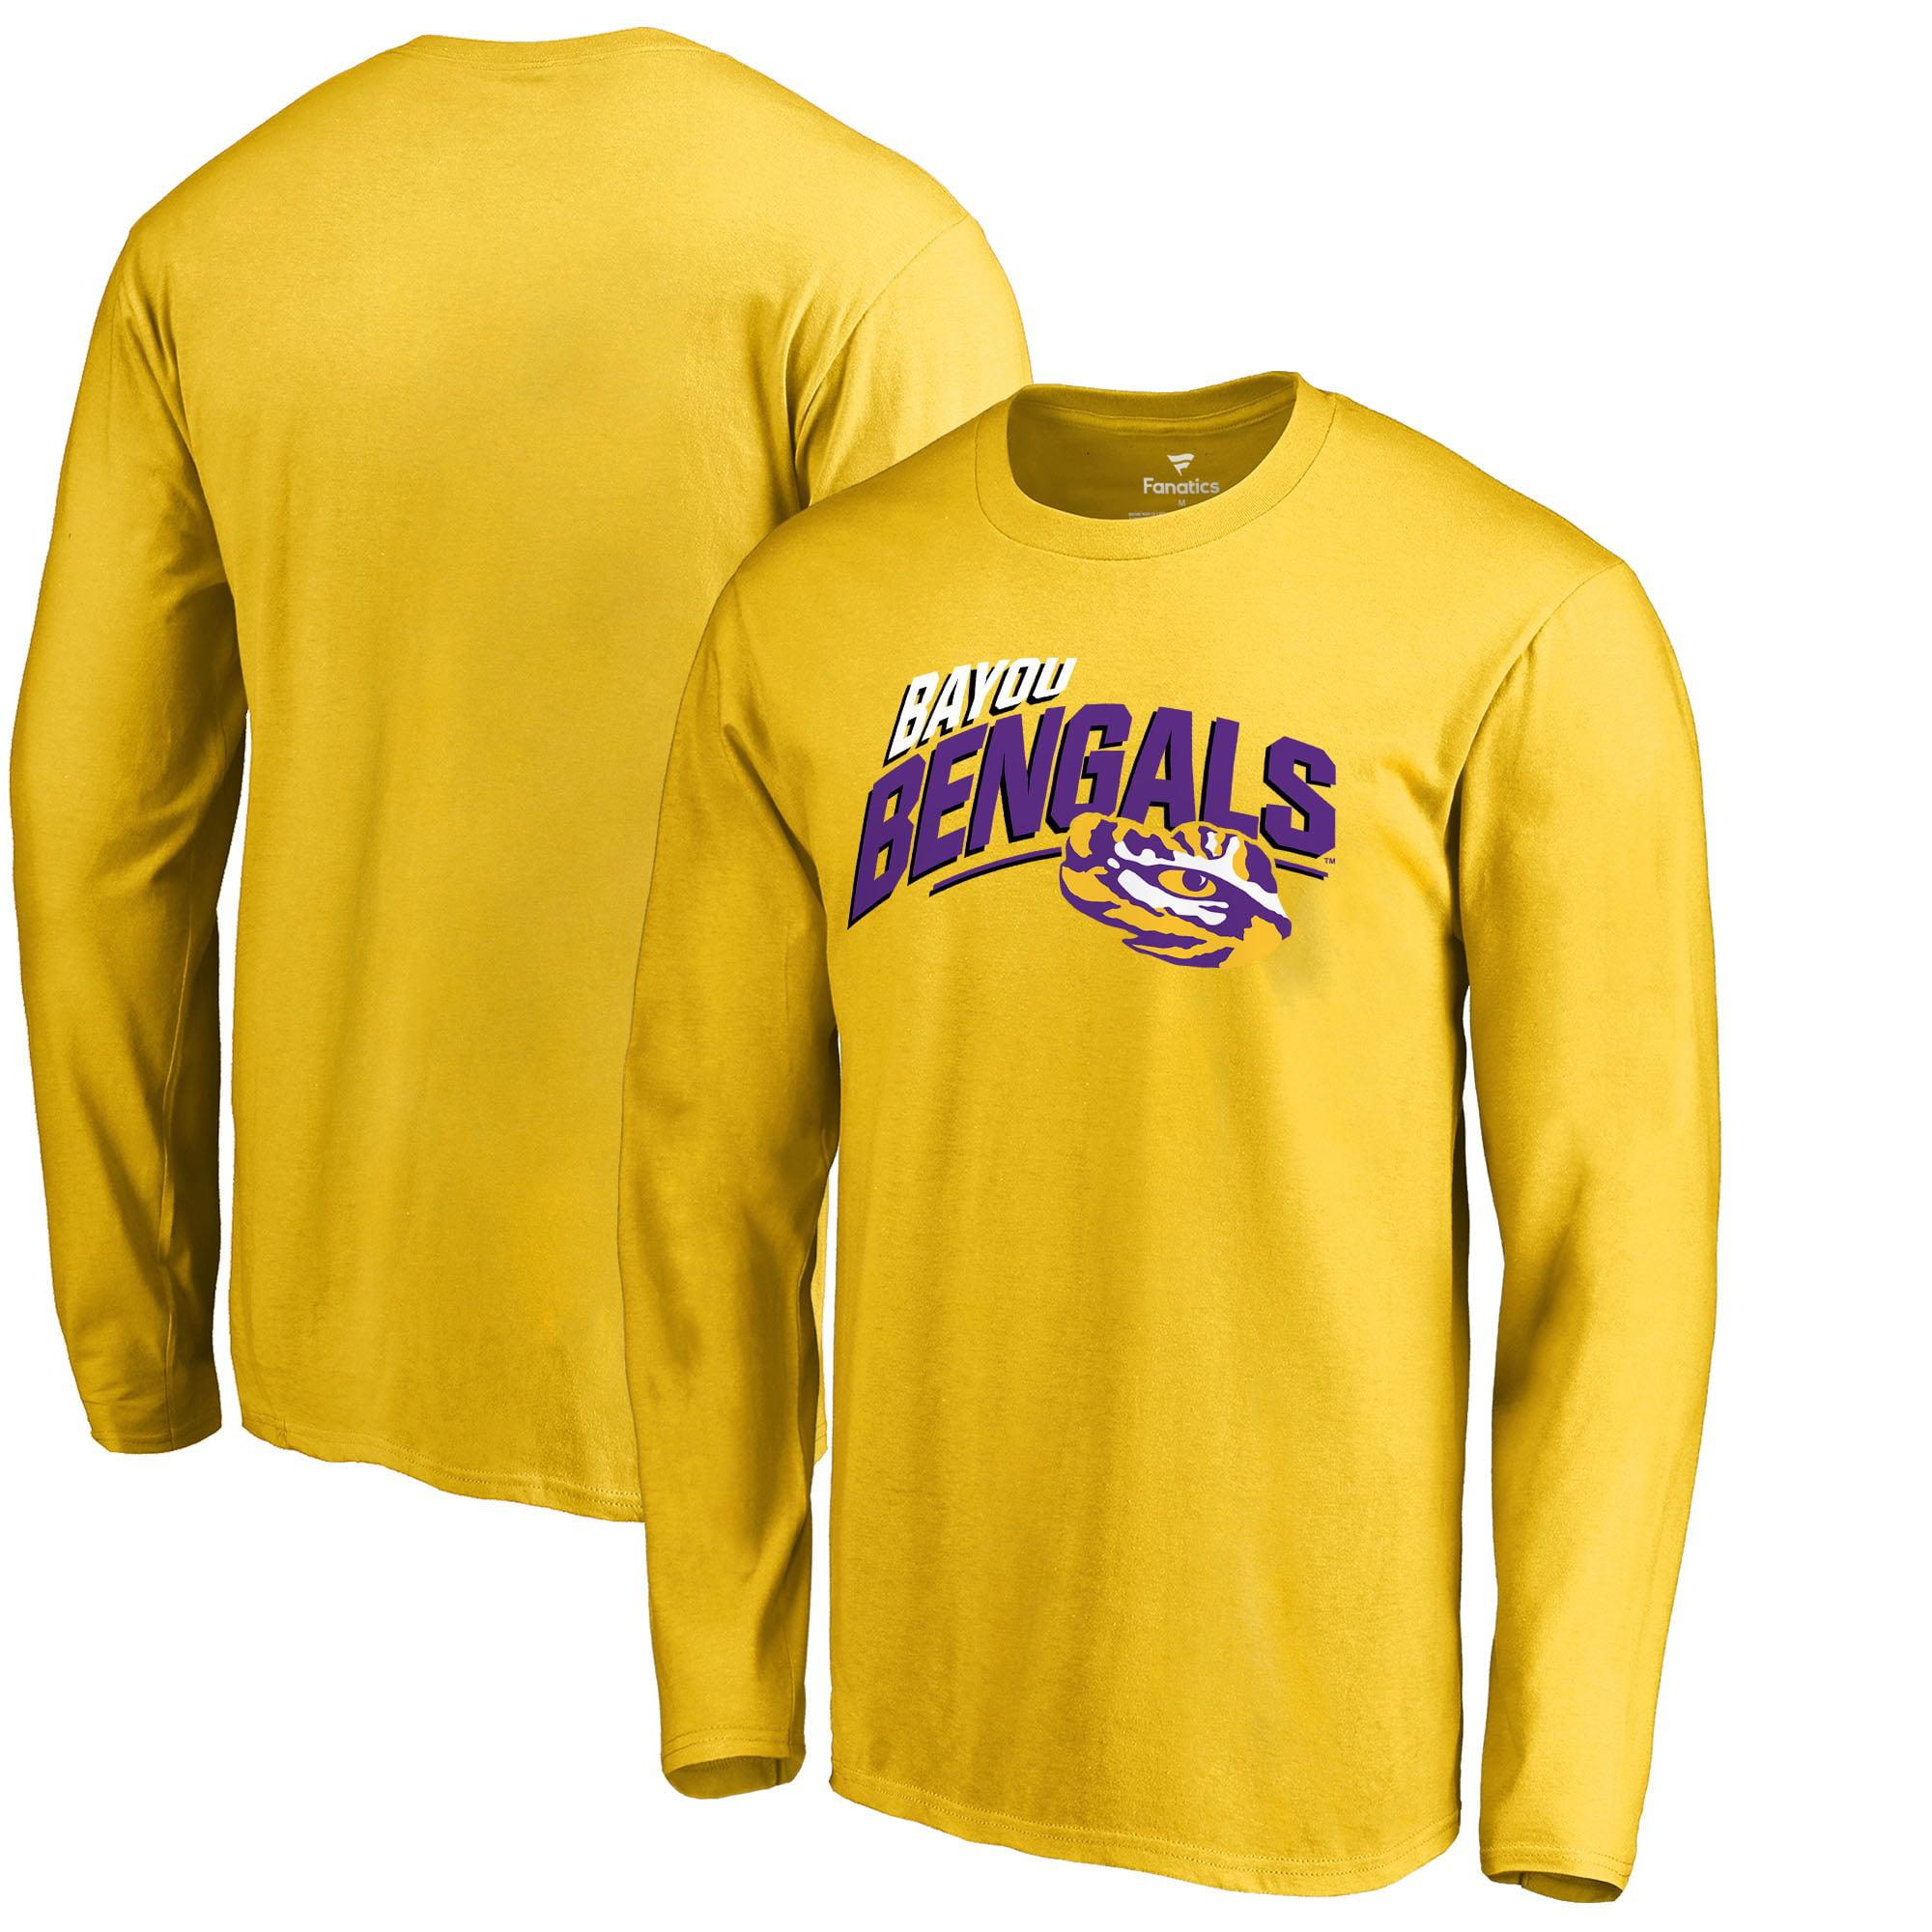 bayou bengals t shirts